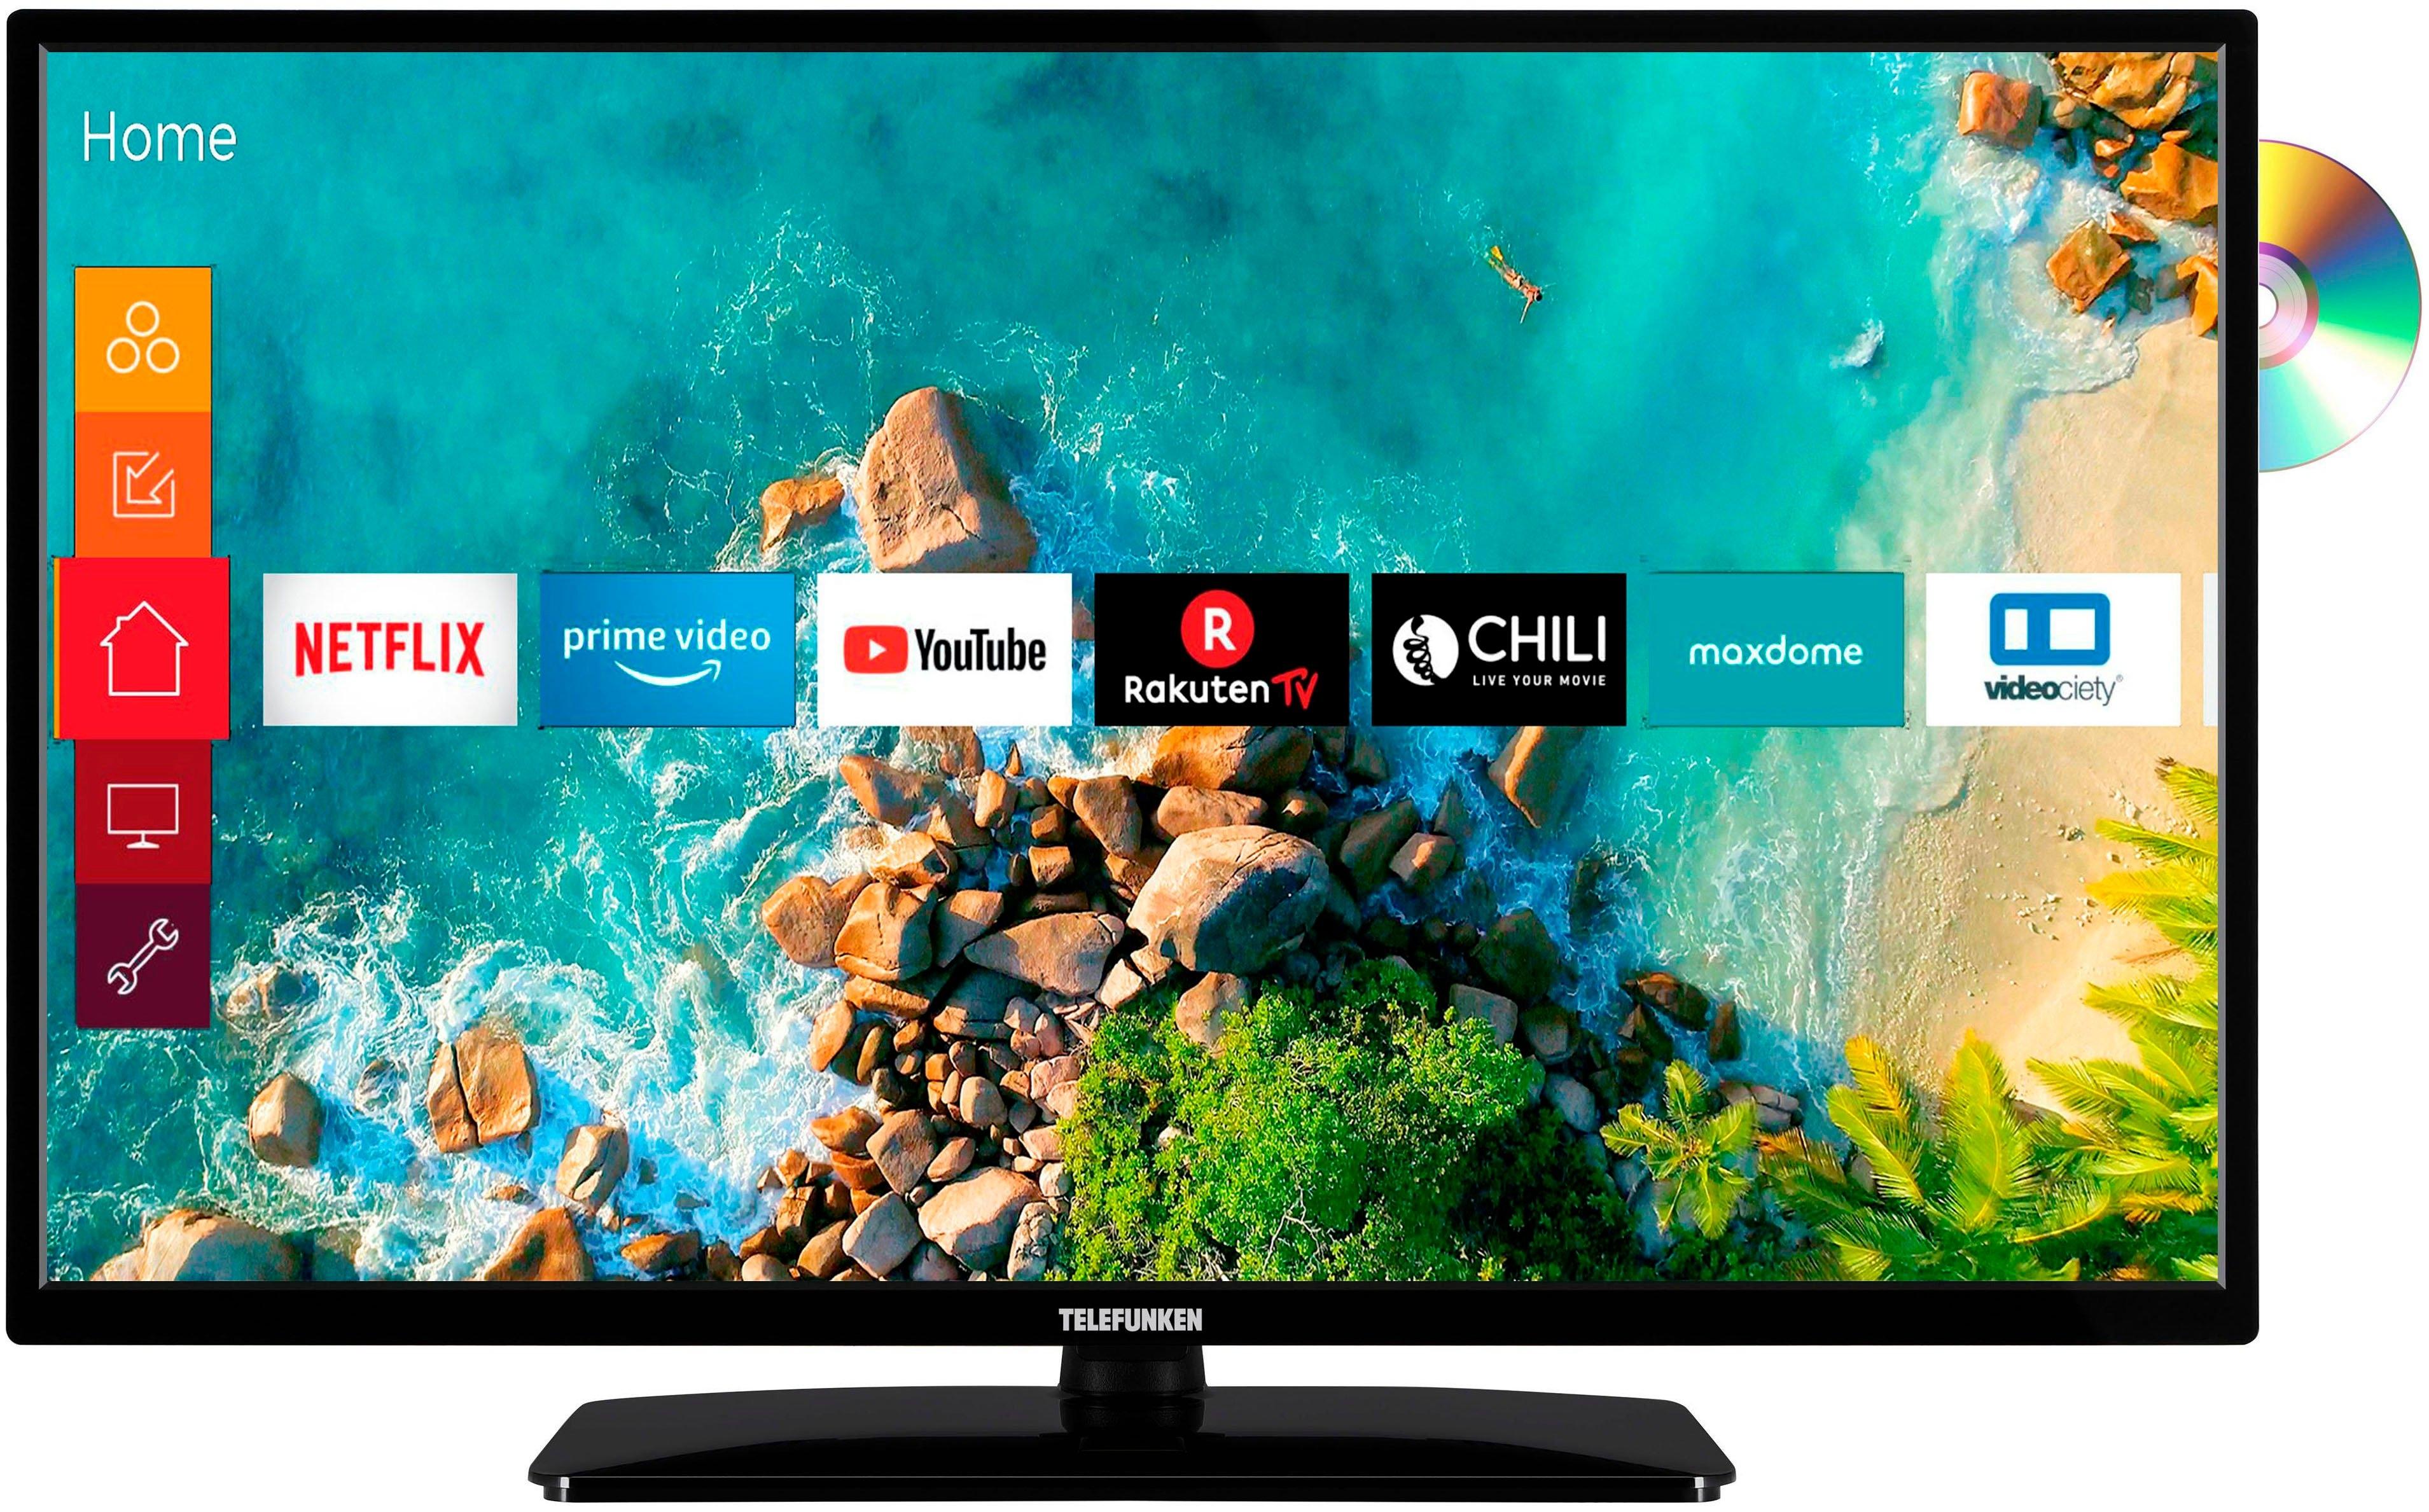 Telefunken LED-TV D32H550M4CWD, 80 cm / 32